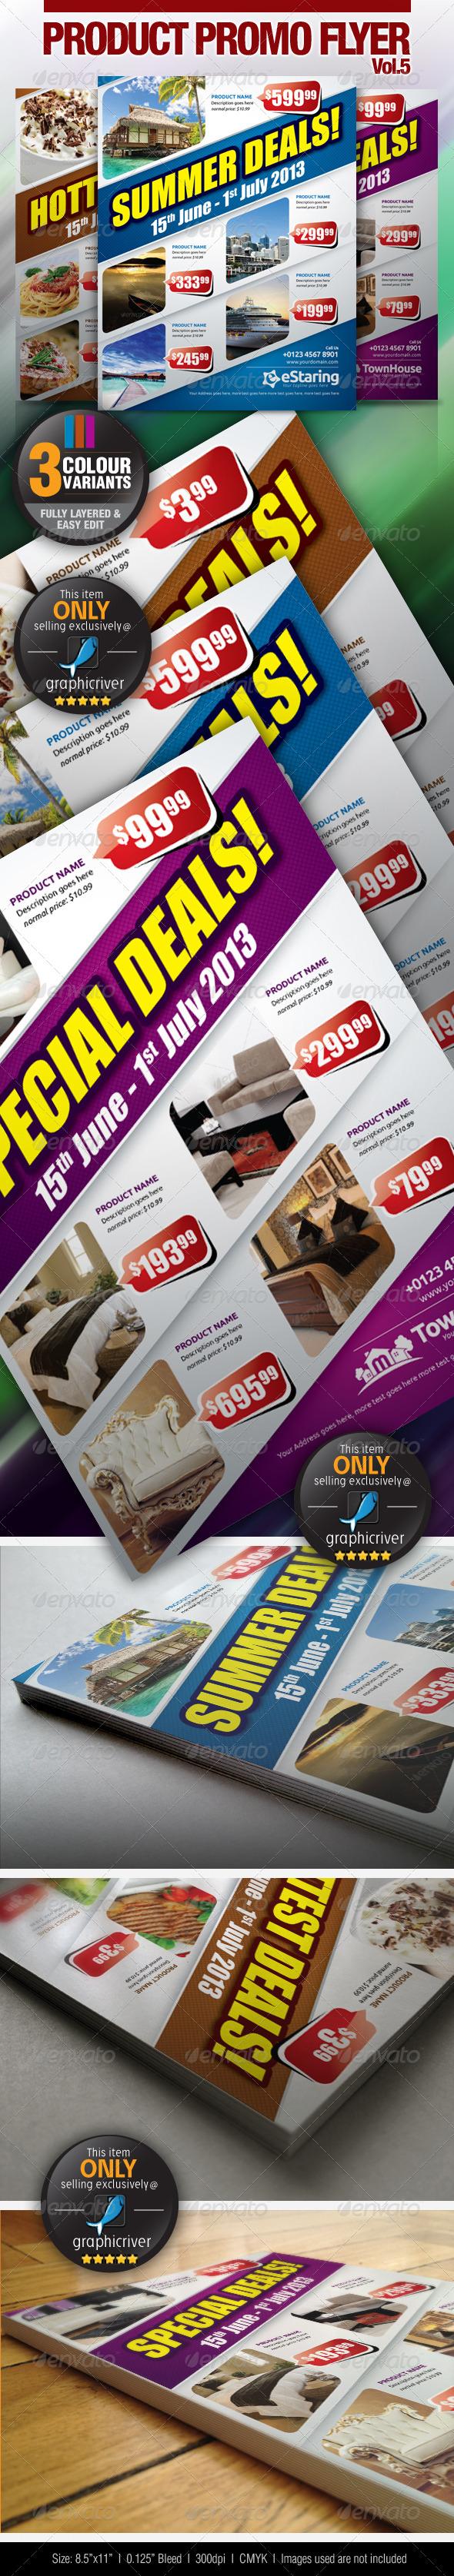 Multi-Purpose Product Promotion Vol.5 - Miscellaneous Events